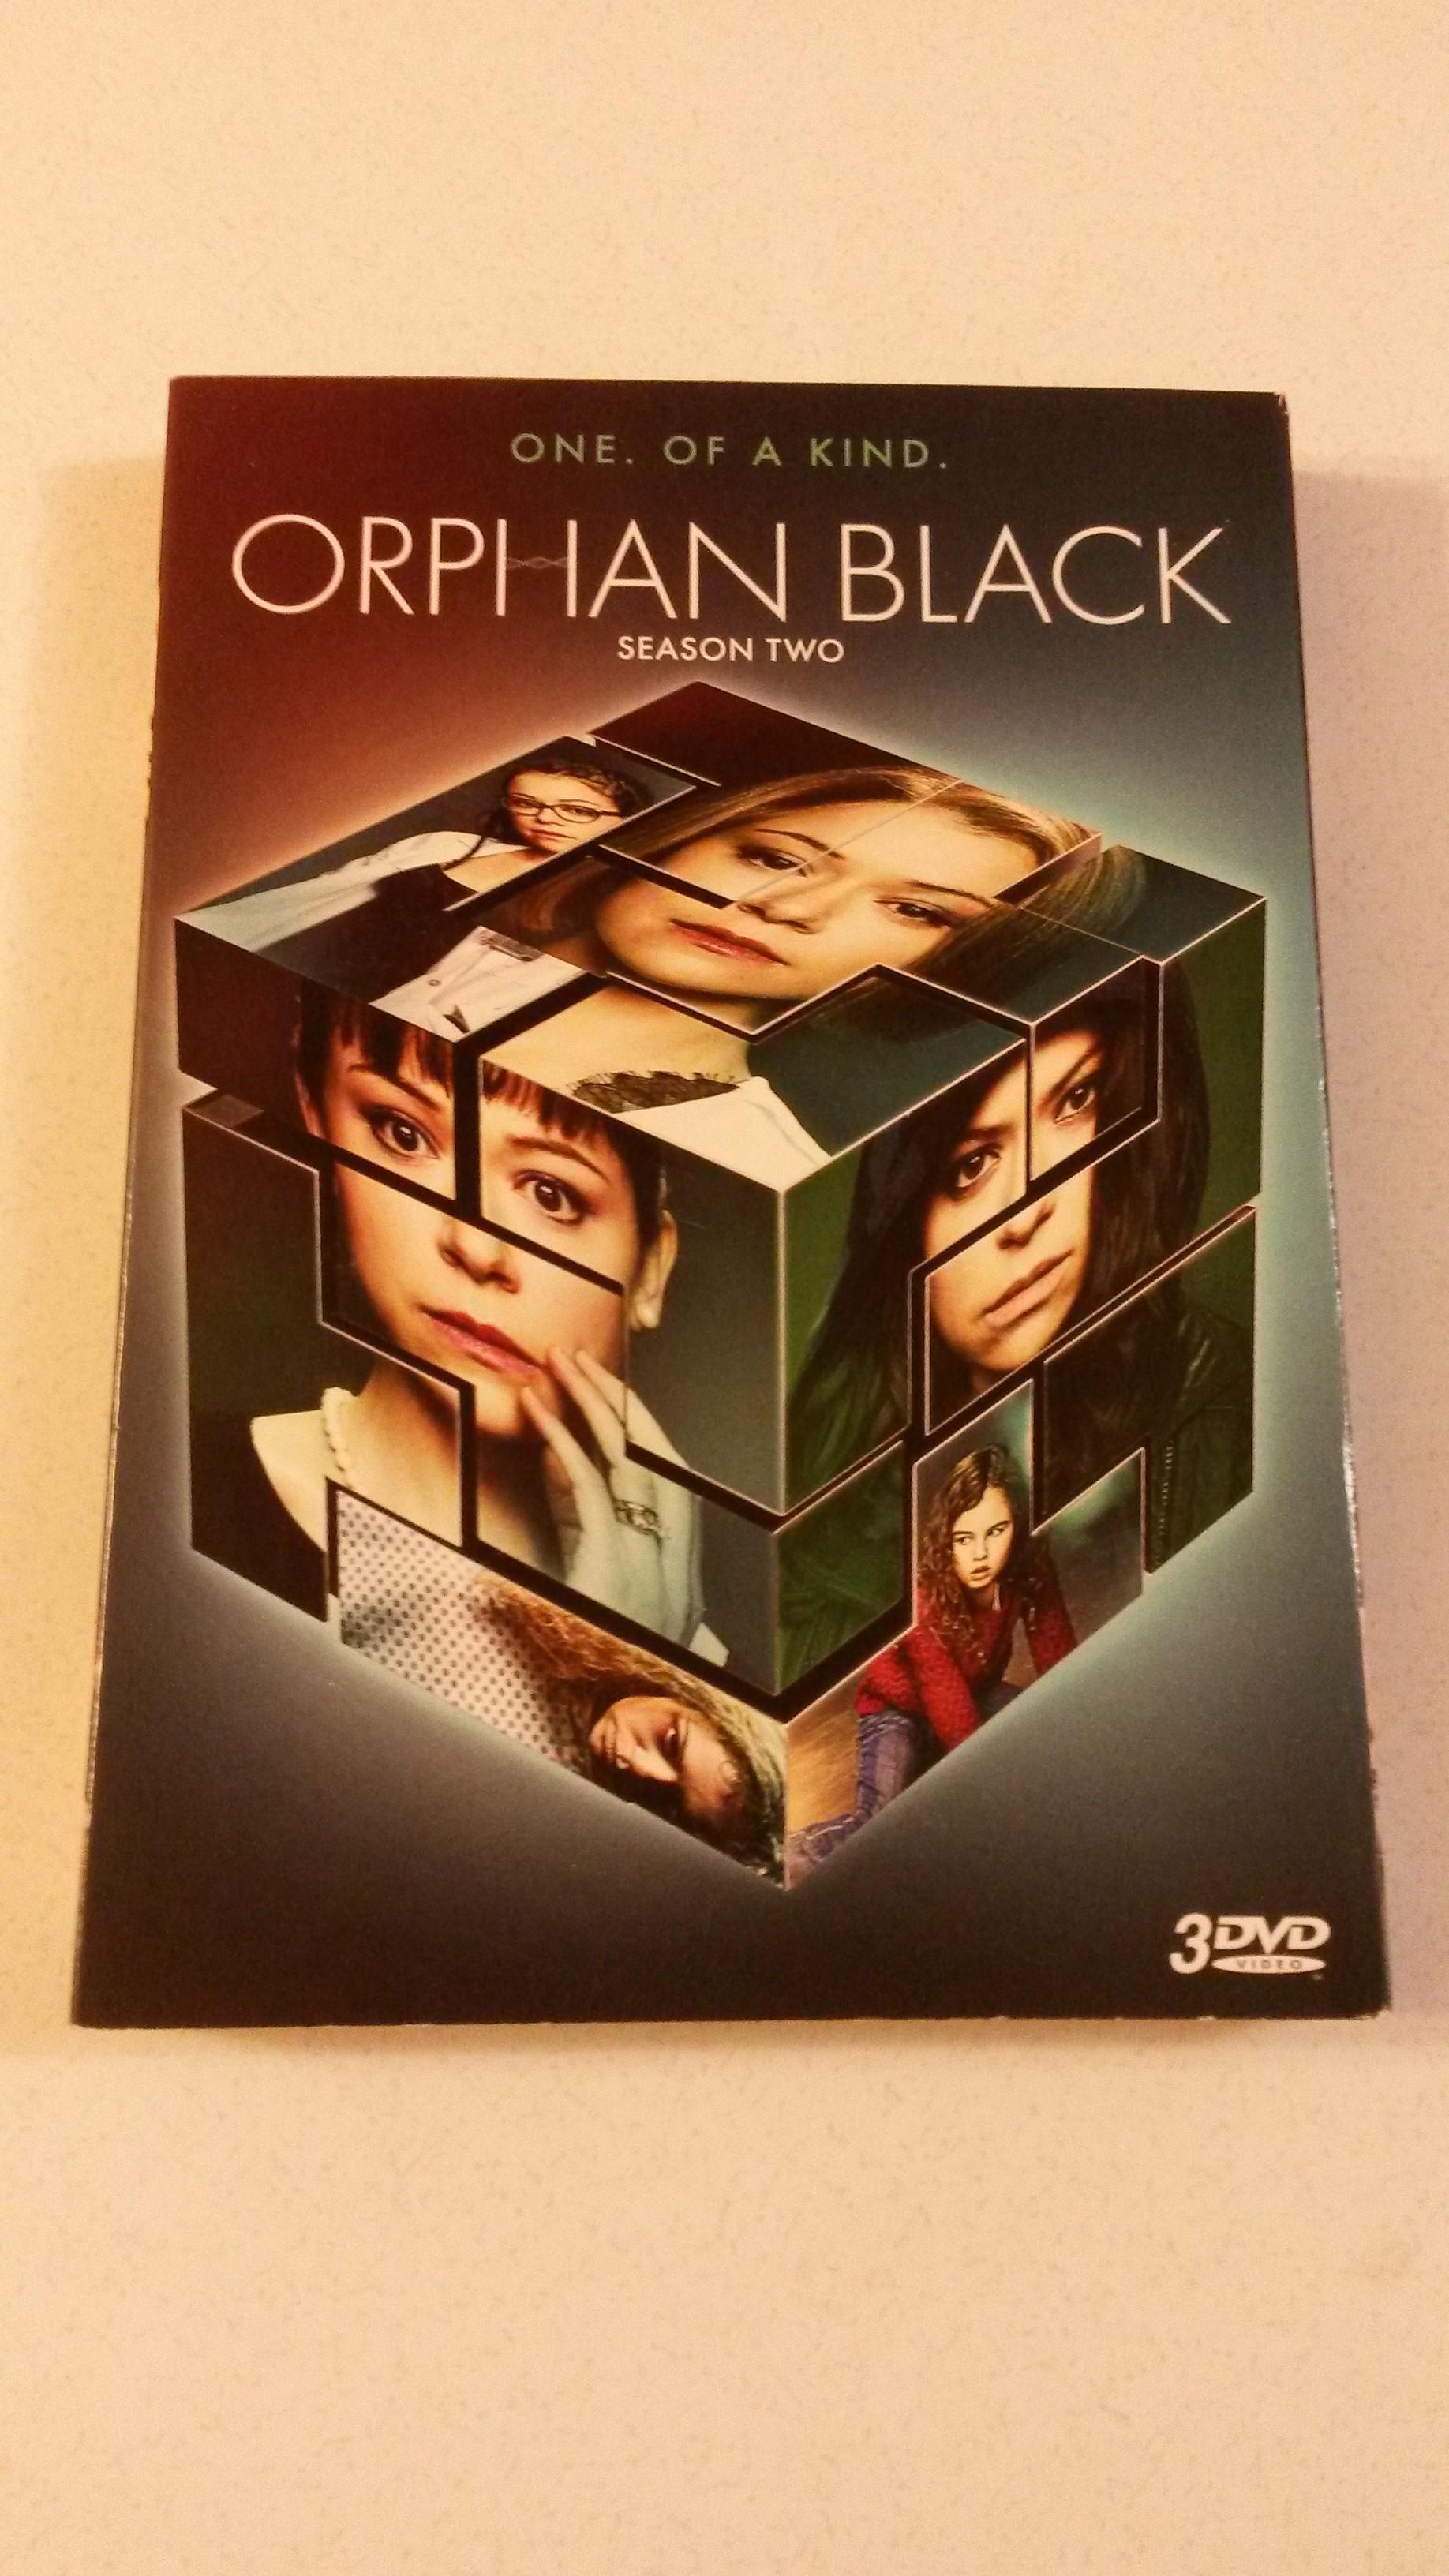 Orphan Black season 2 DVD set